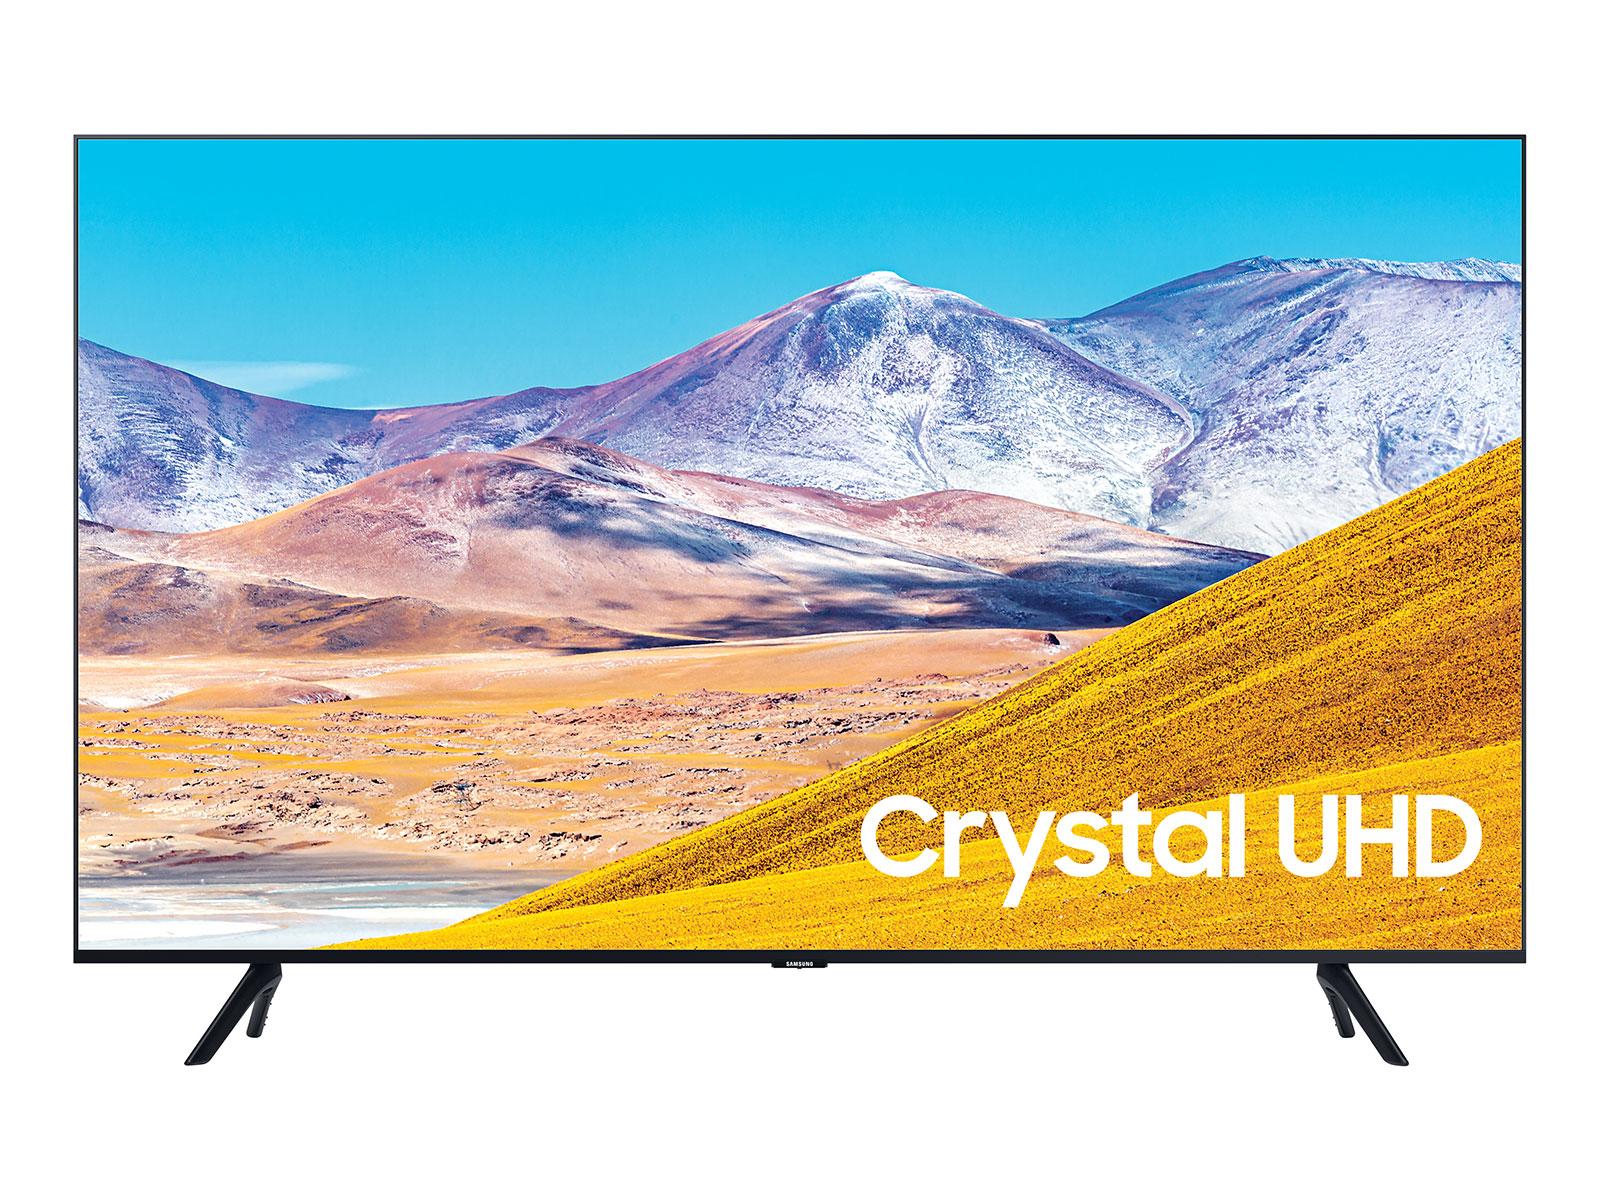 Samsung Tv 65 Class TU8000 in Kenya Crystal UHD 4K Smart